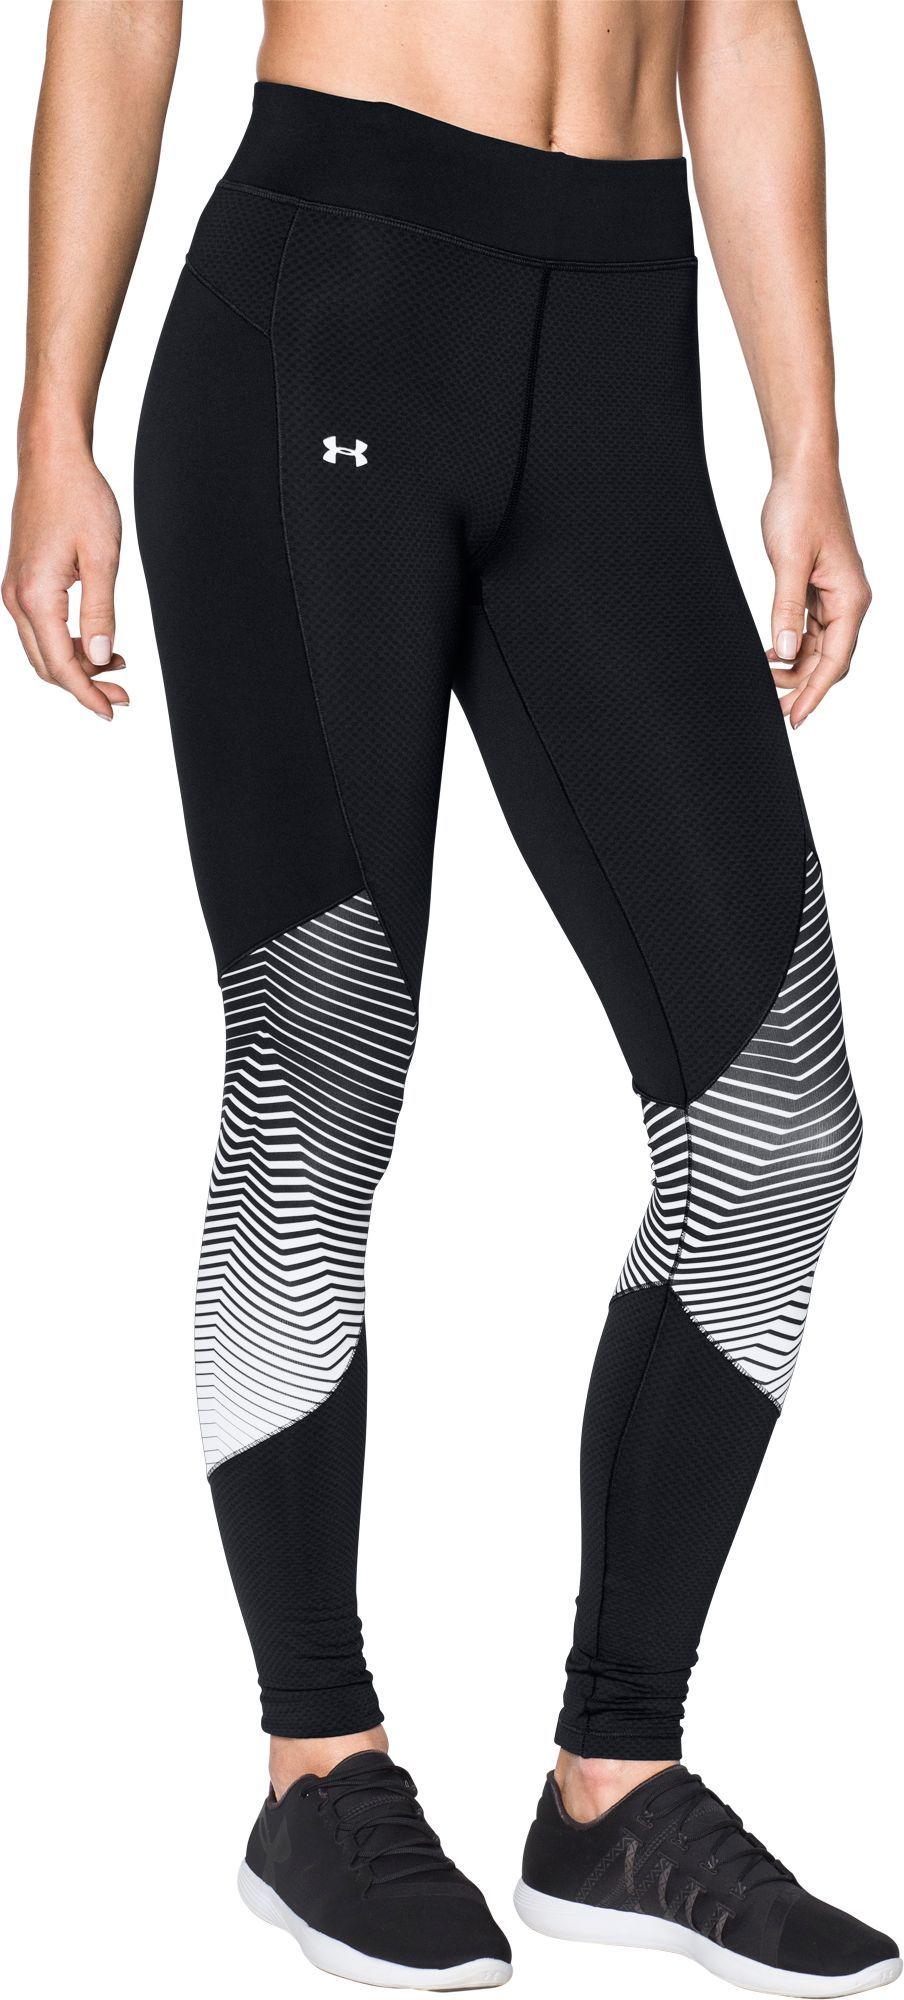 0d686f986e0cf1 Under Armour Women's ColdGear Reactor Graphic Leggings, Size: Medium, Black